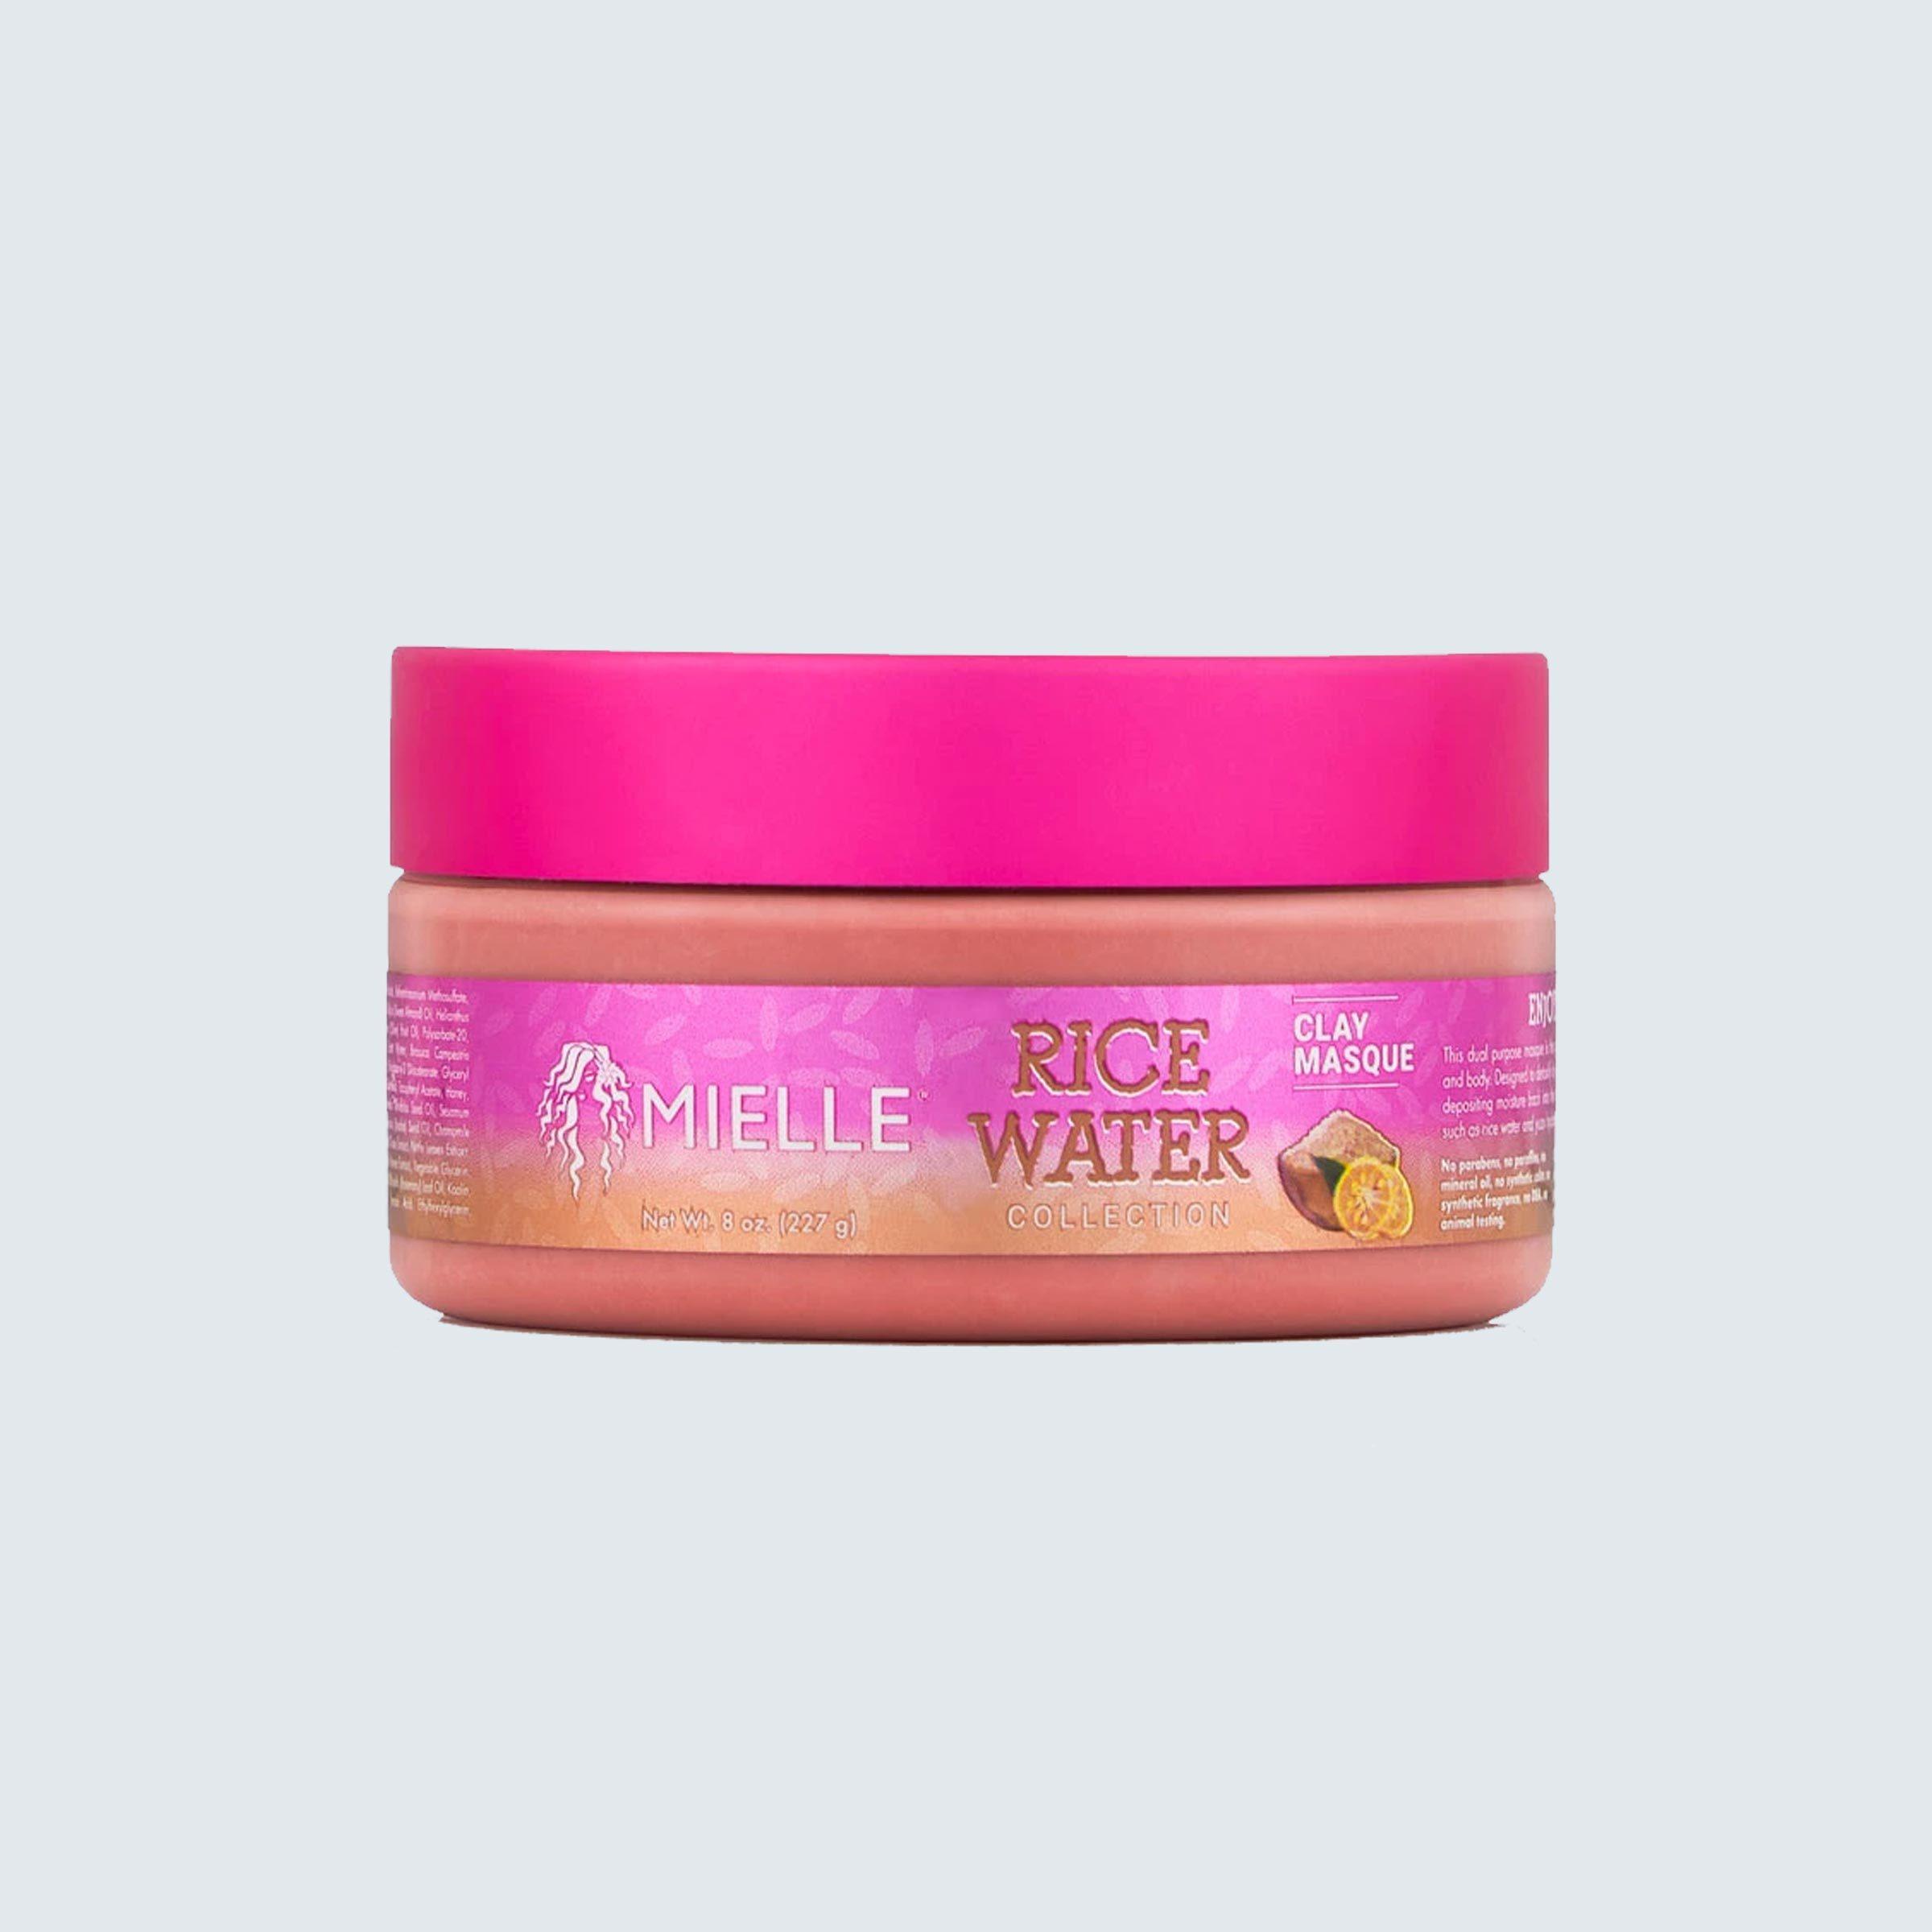 Mielle Organics Rice Water Clay Masque